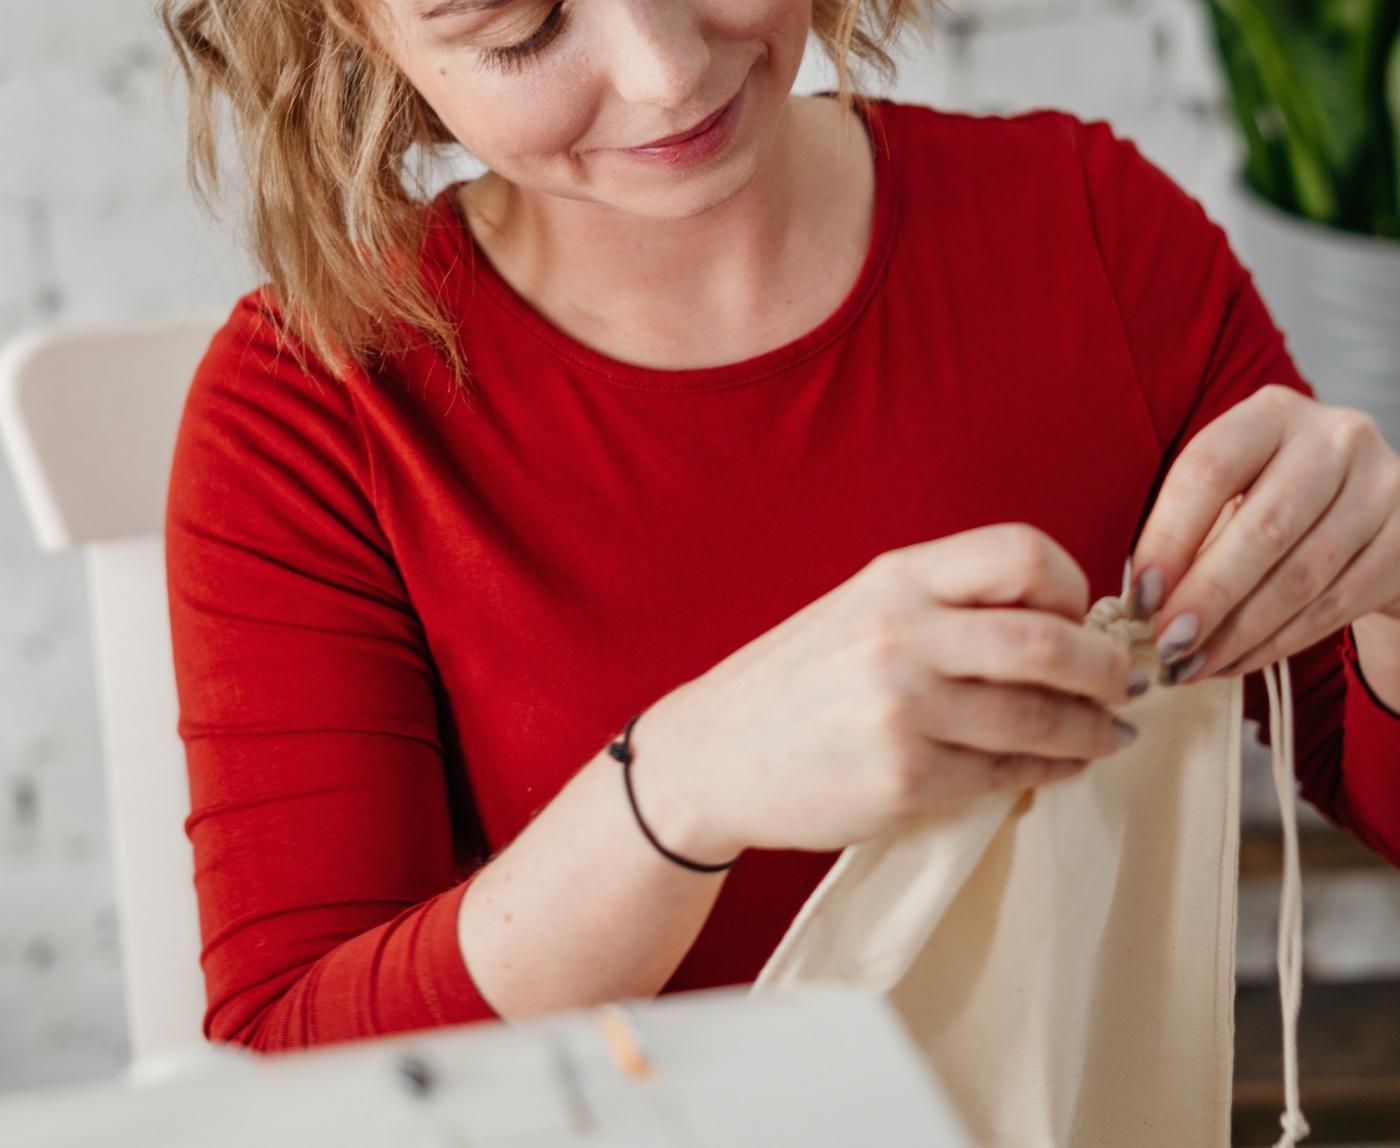 Patagonia Empowers Customers to Make Repairs via Online Sewing Tutorials